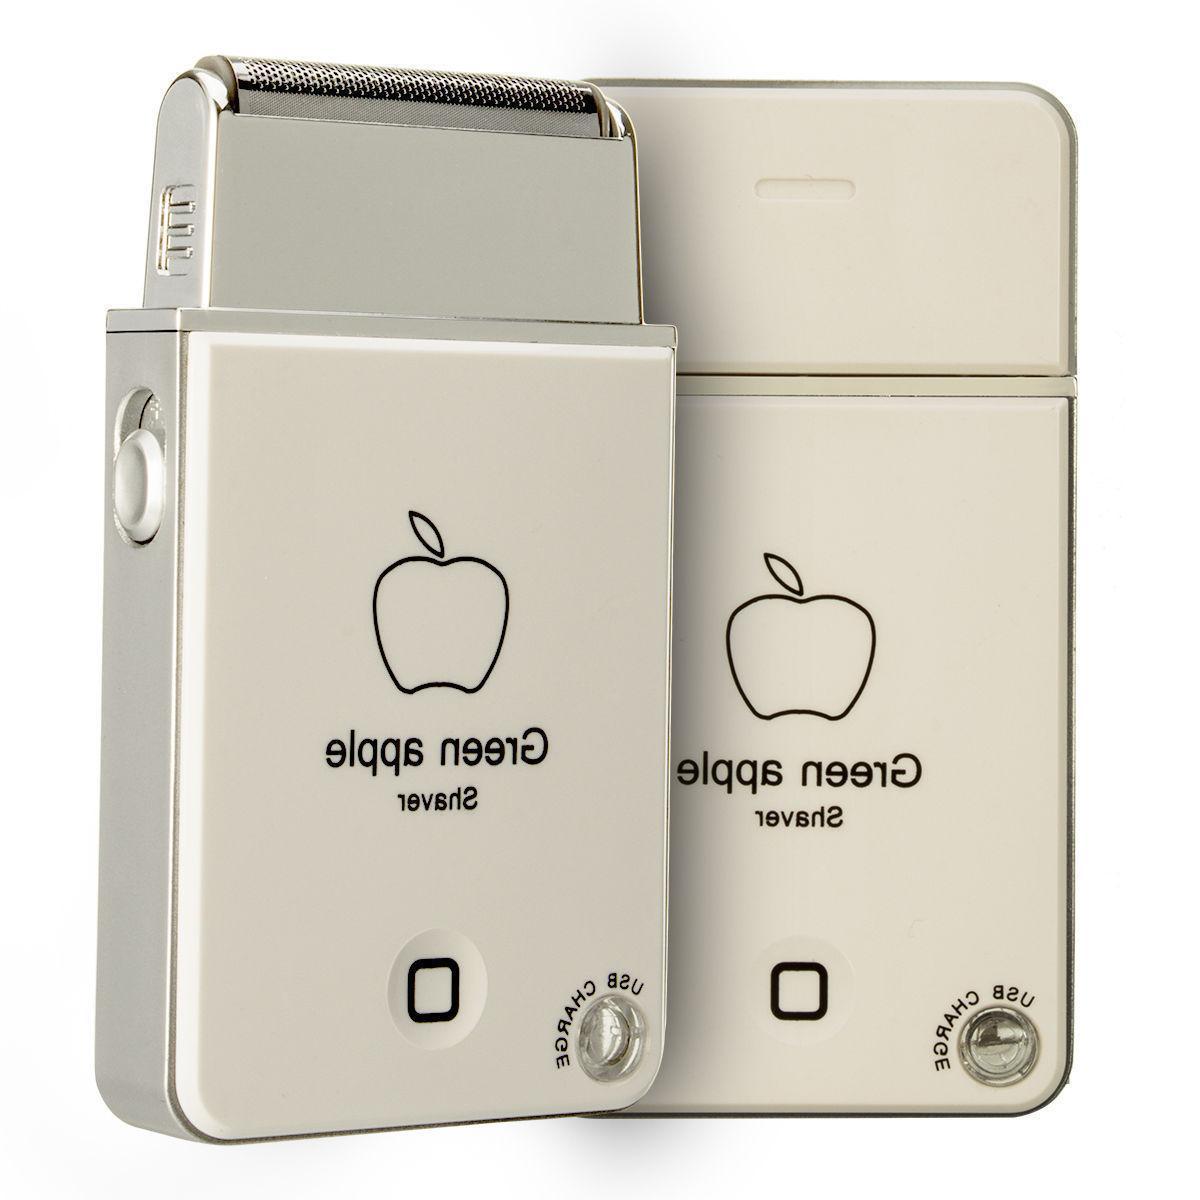 Mini Portable Men's Electric Foil Shaver Razor USB Rechargea